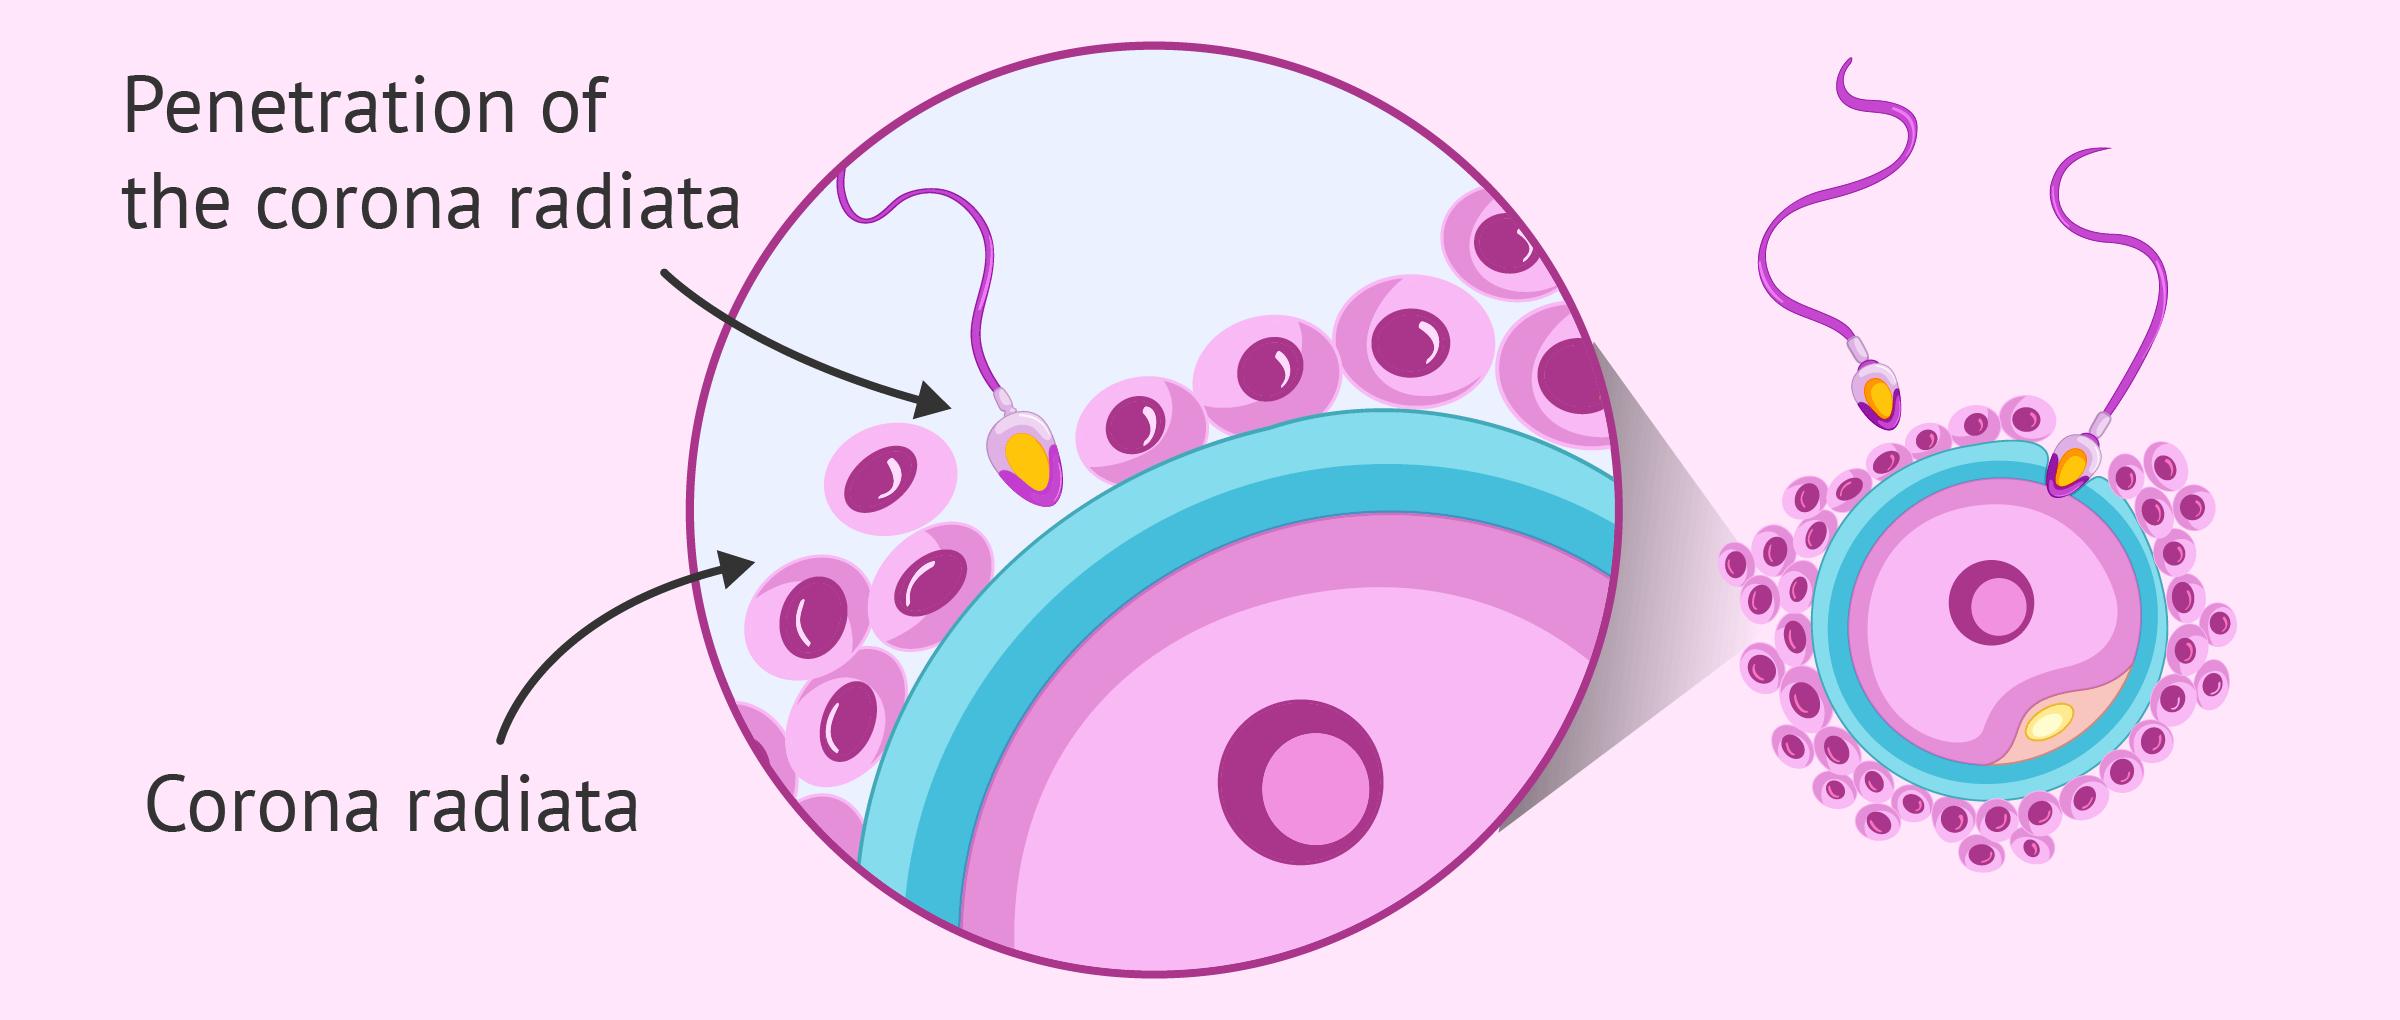 Penetration of the corona radiata